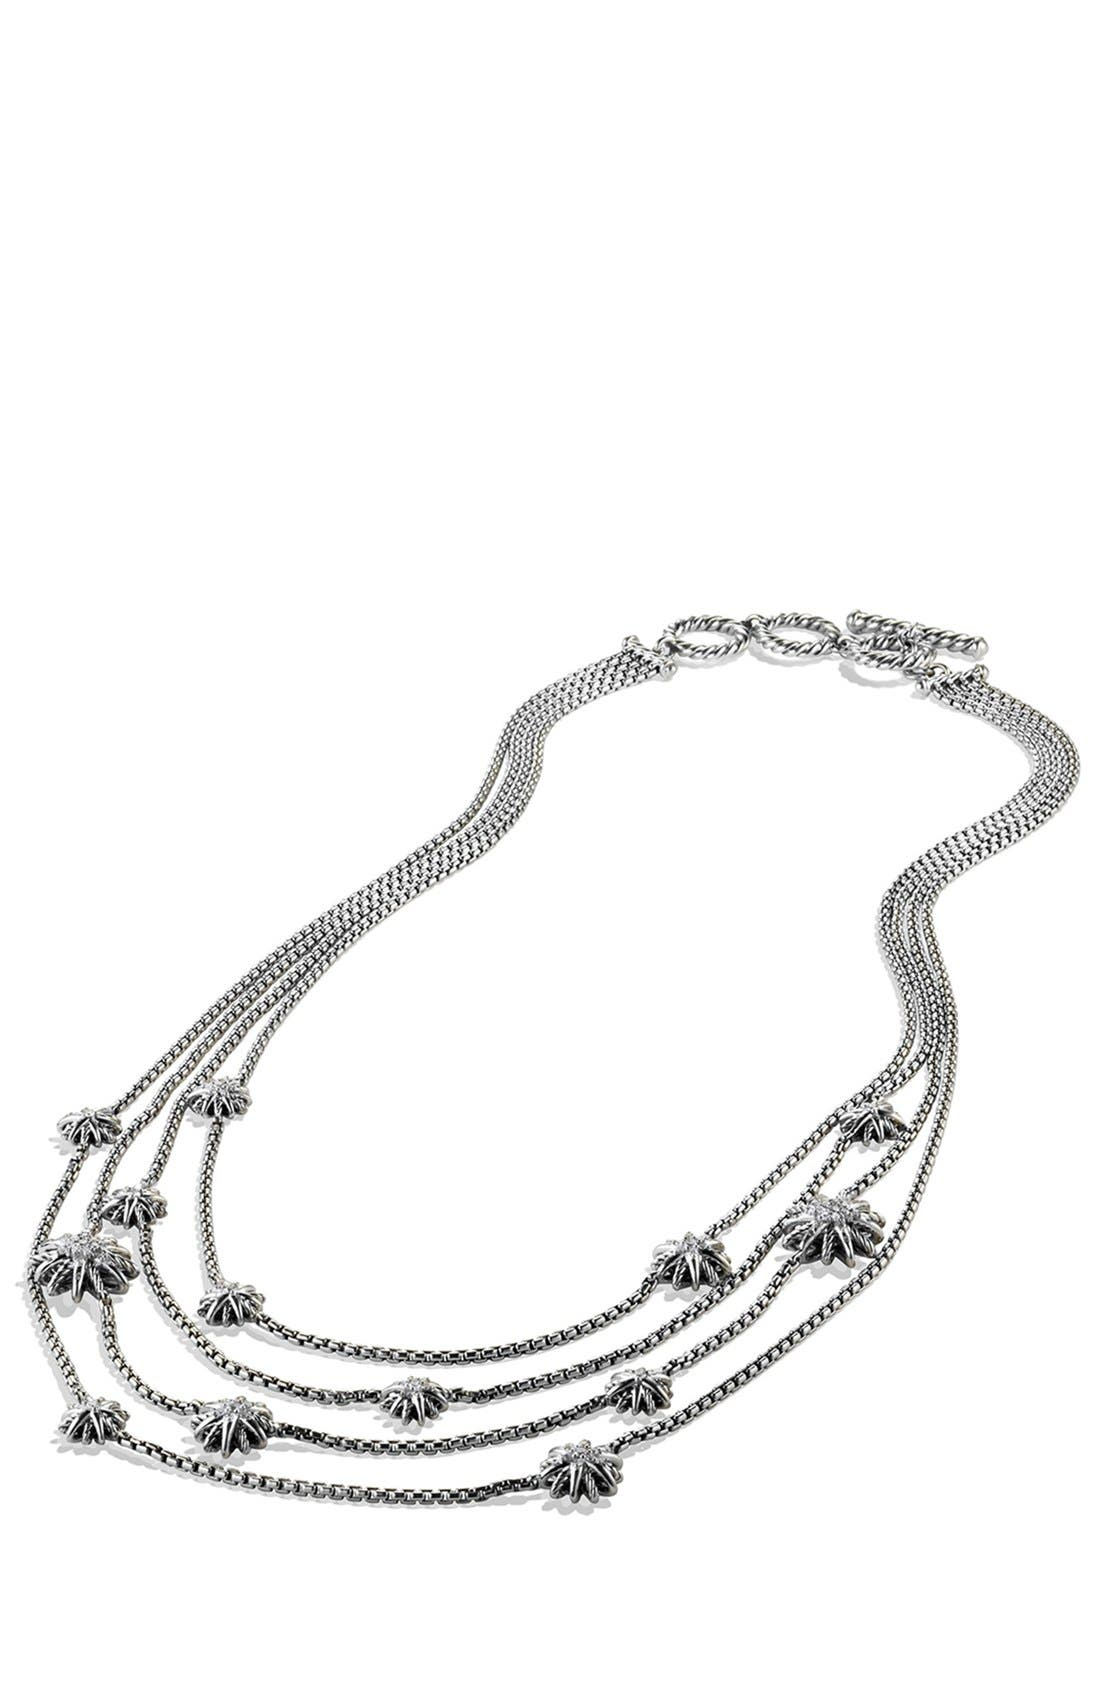 Alternate Image 2  - David Yurman 'Starburst' Chain Necklace with Diamonds